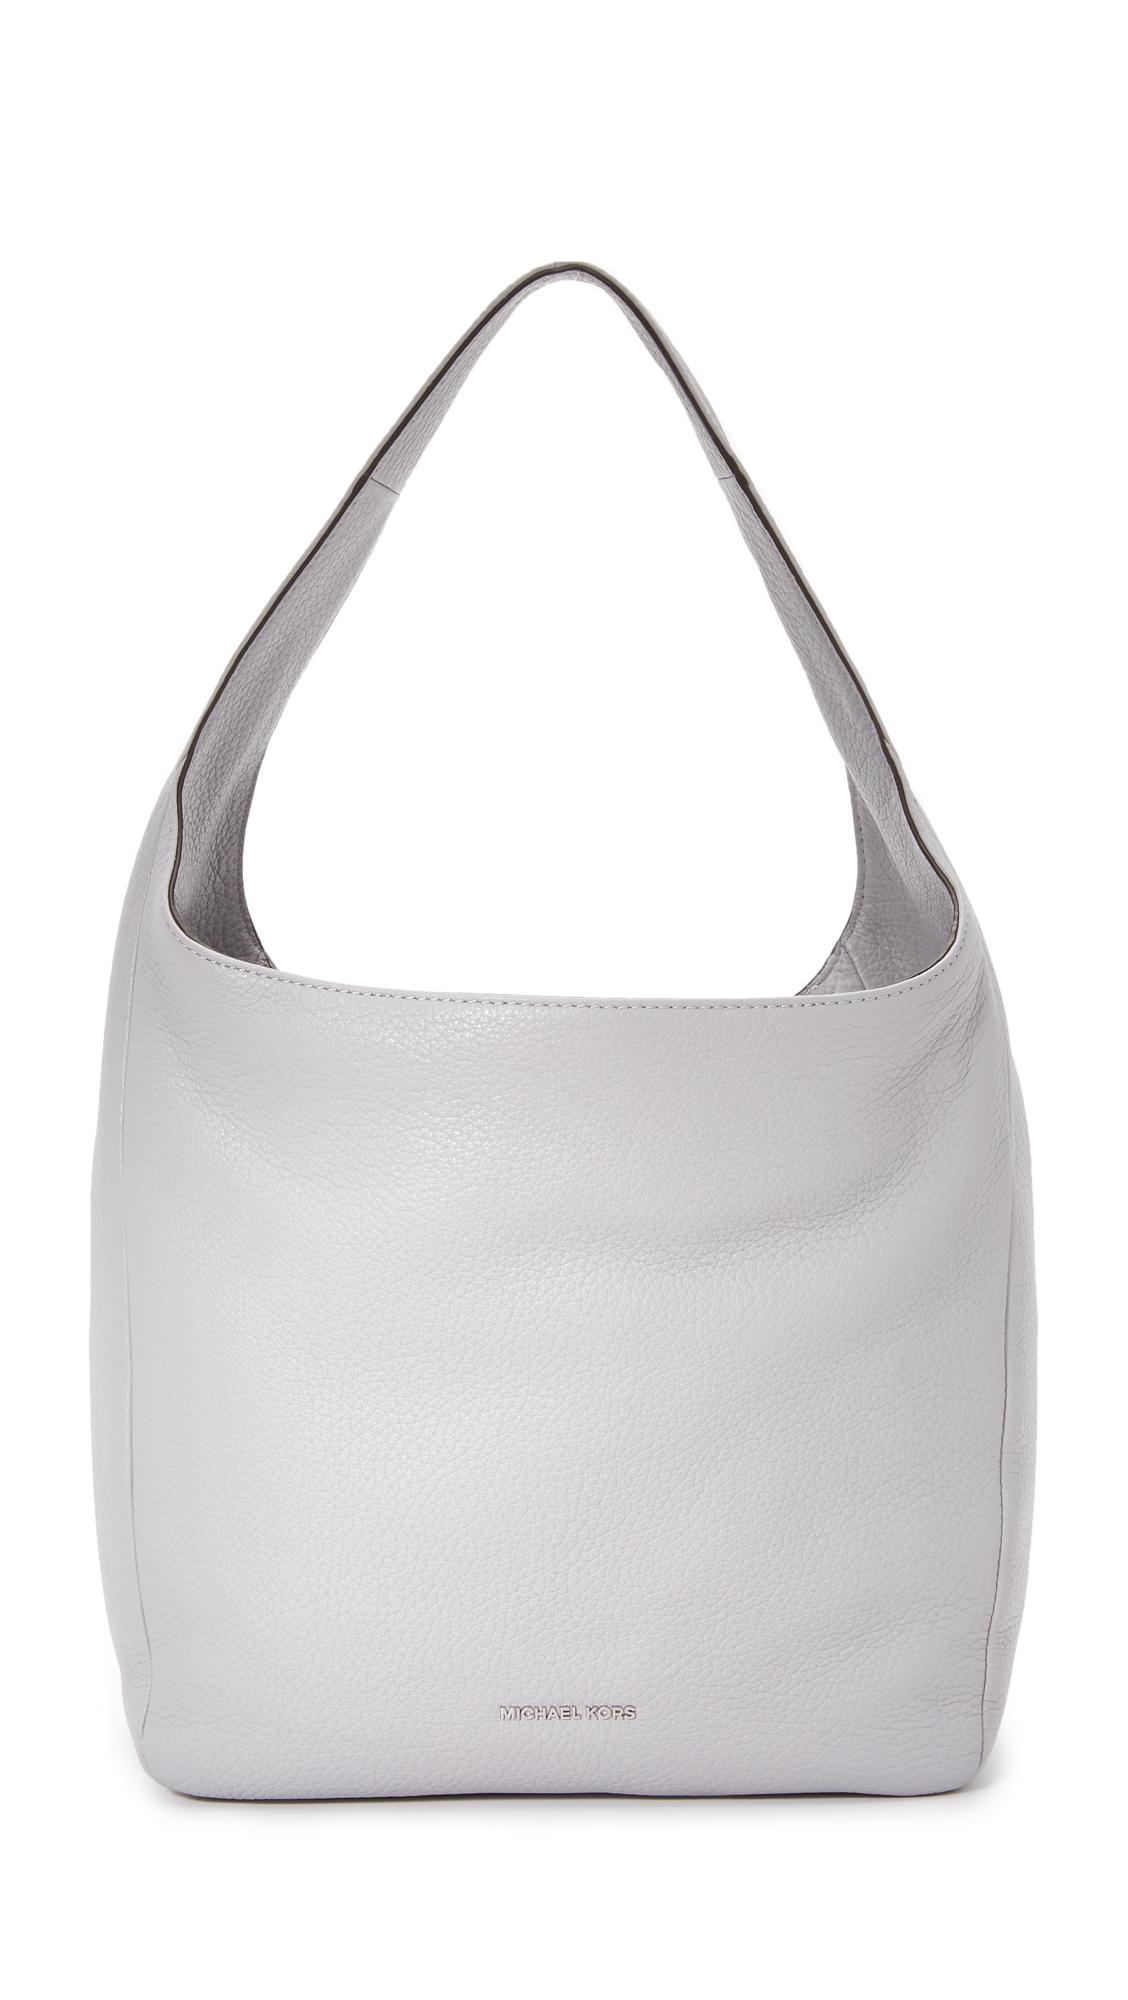 16791cf68fd5 Lyst - MICHAEL Michael Kors Lena Hobo Bag in Gray